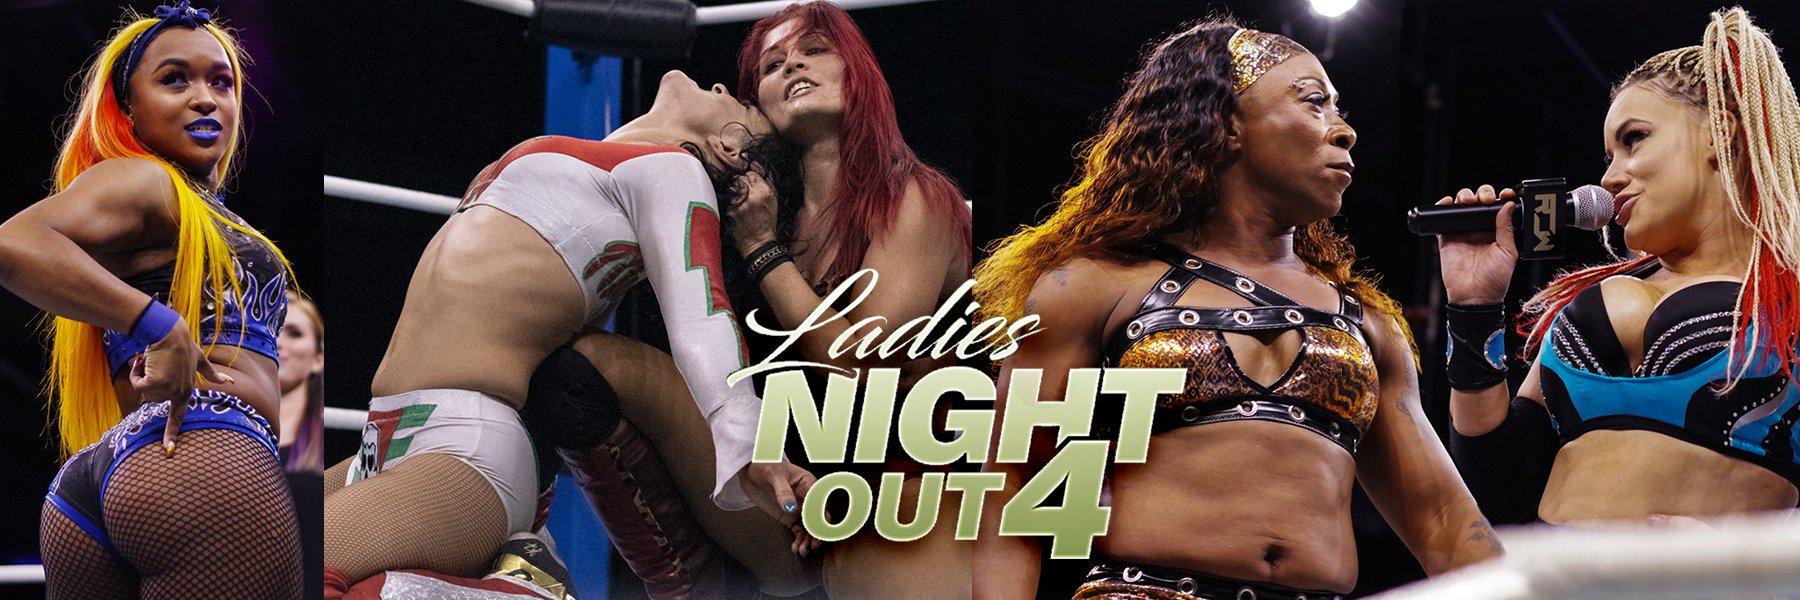 Ladies Night Out 4 - Taya Valkyrie vs Jazz, Ivelisse vs Thunder, Su Yung